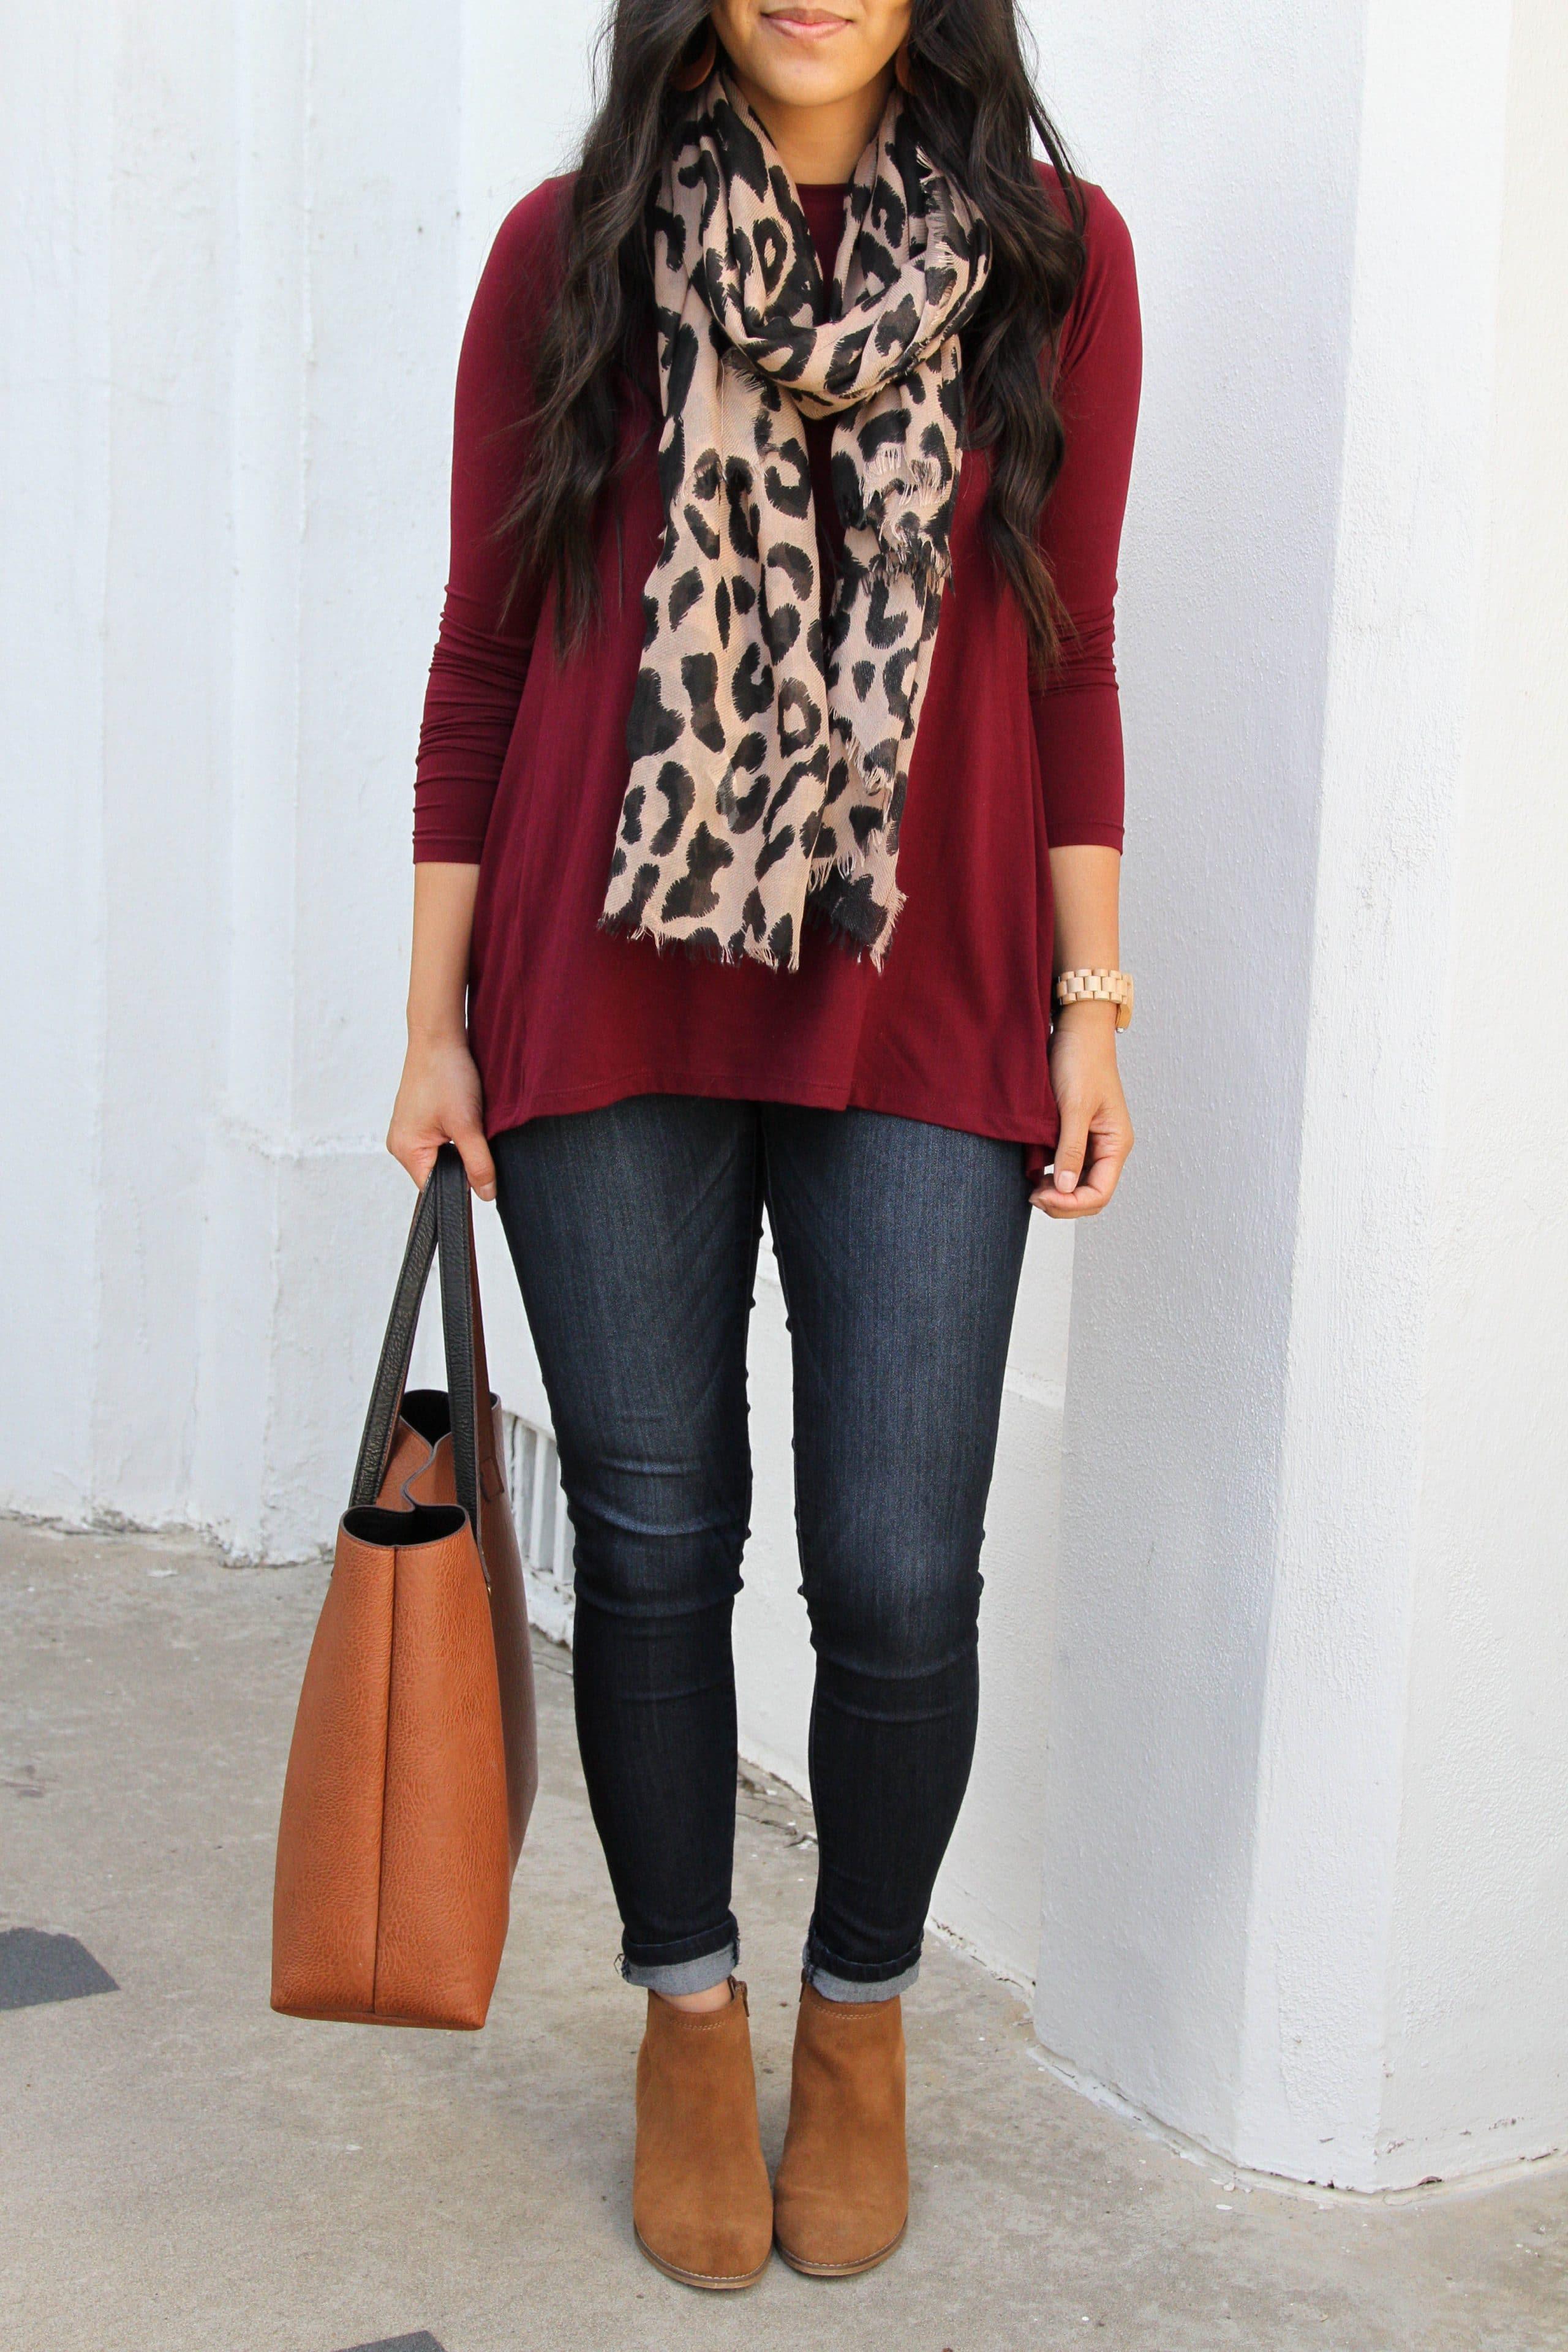 jeans + maroon top + tan booties + l leopard scarf